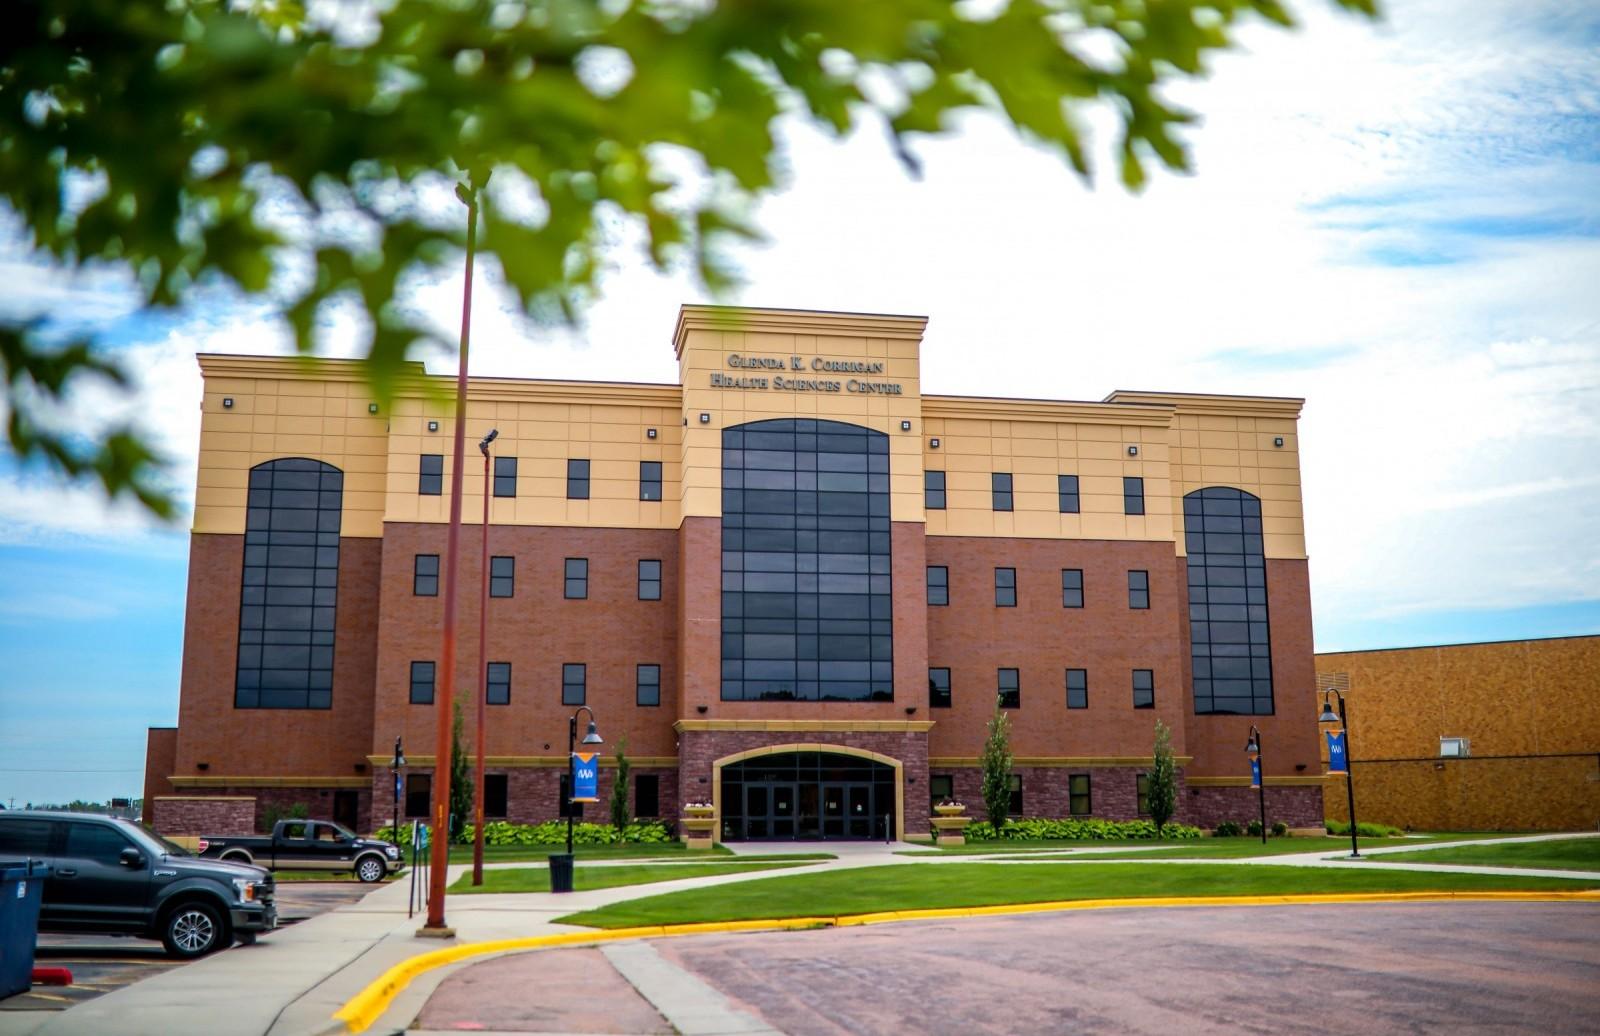 Corrigan Health Sciences Center